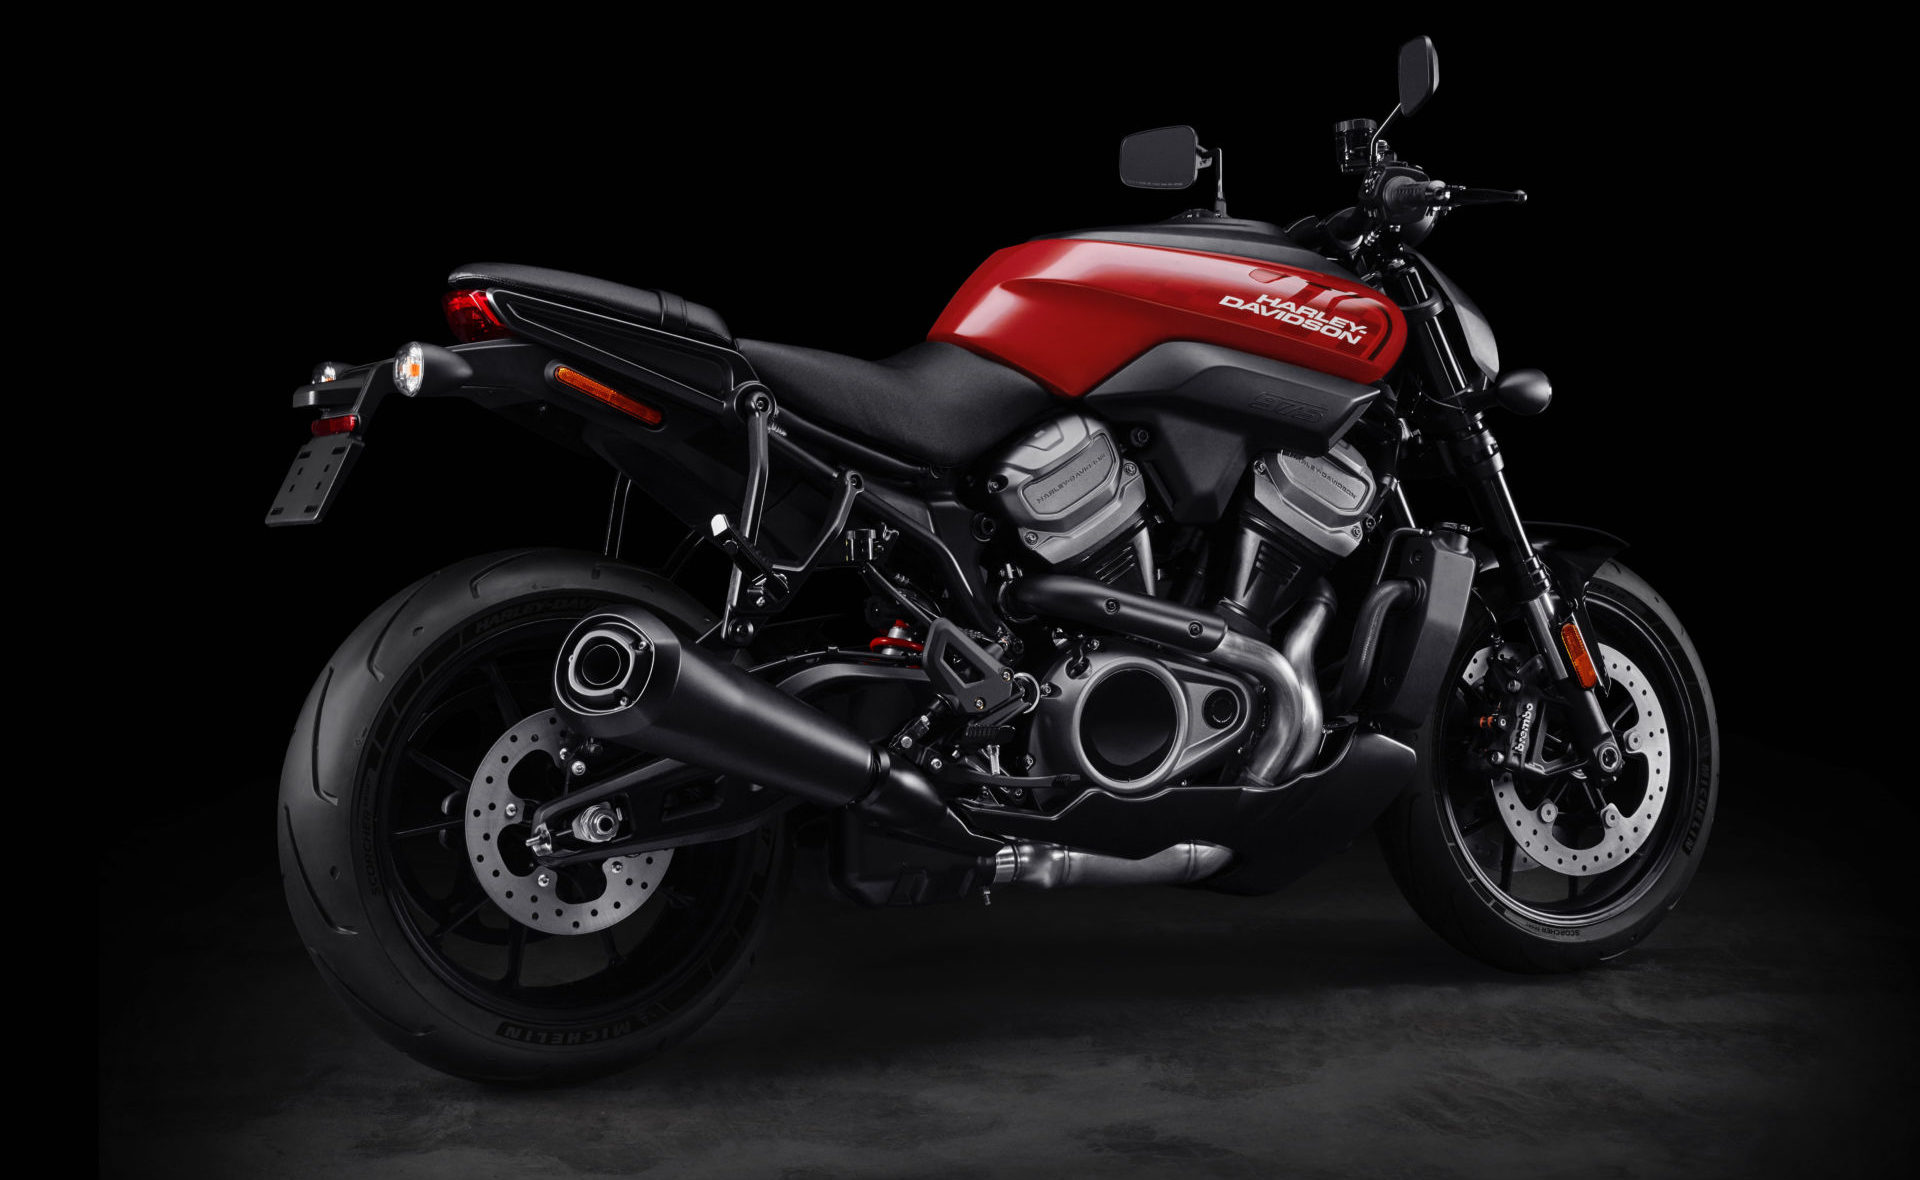 Harley-Davidson's new